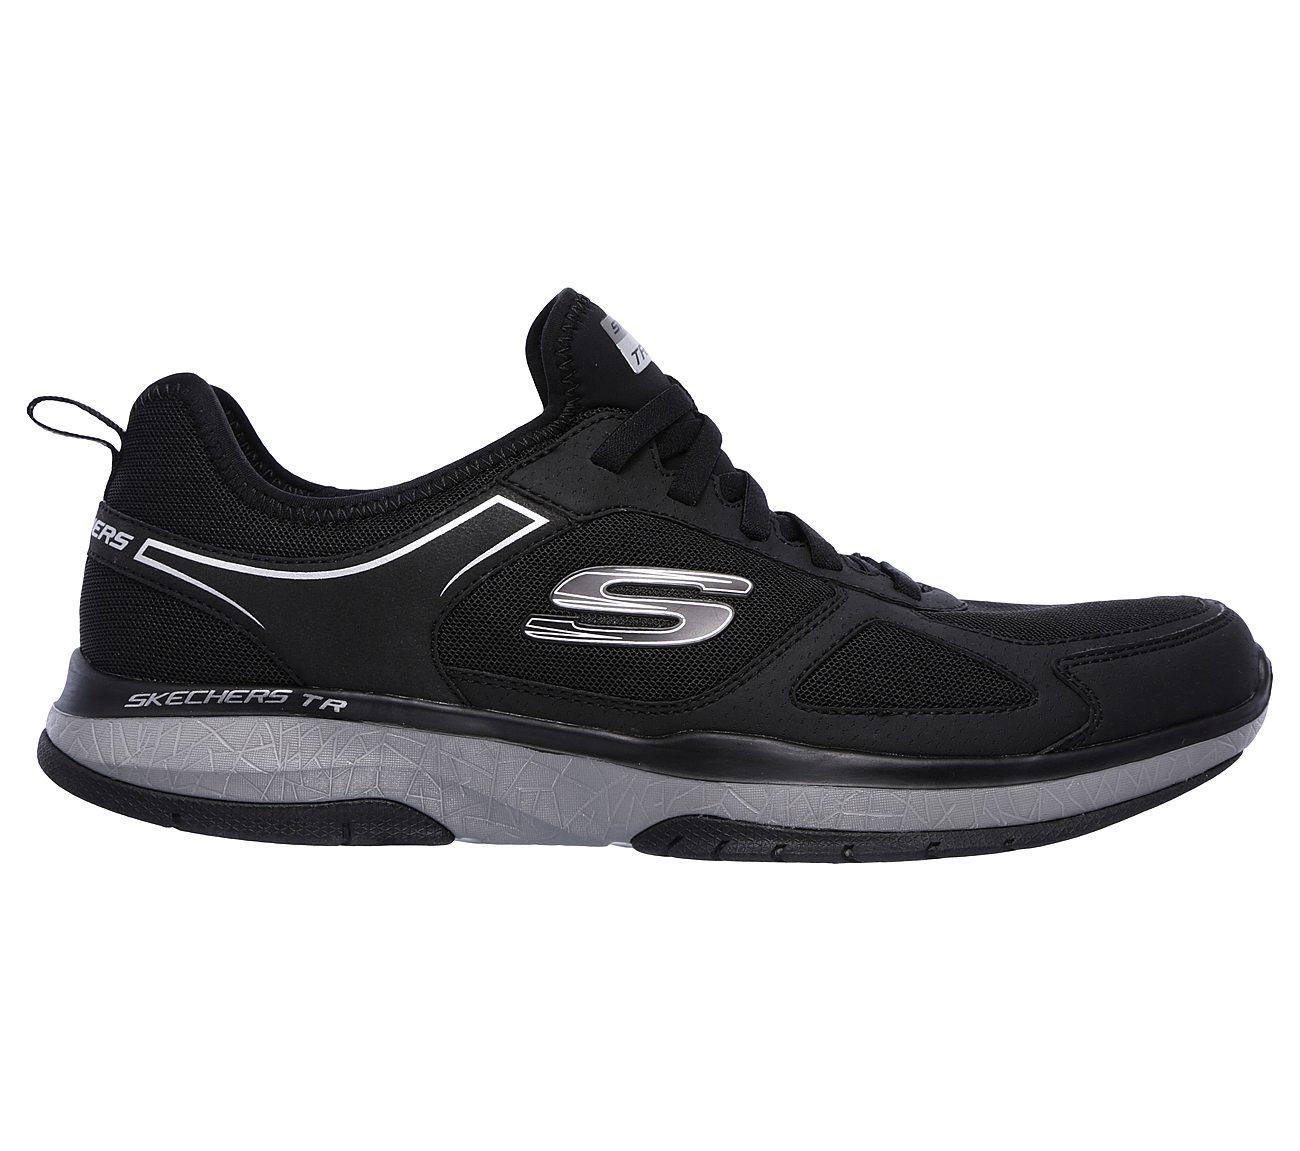 Buy SKECHERS Burst TR SKECHERS Sport Shoes